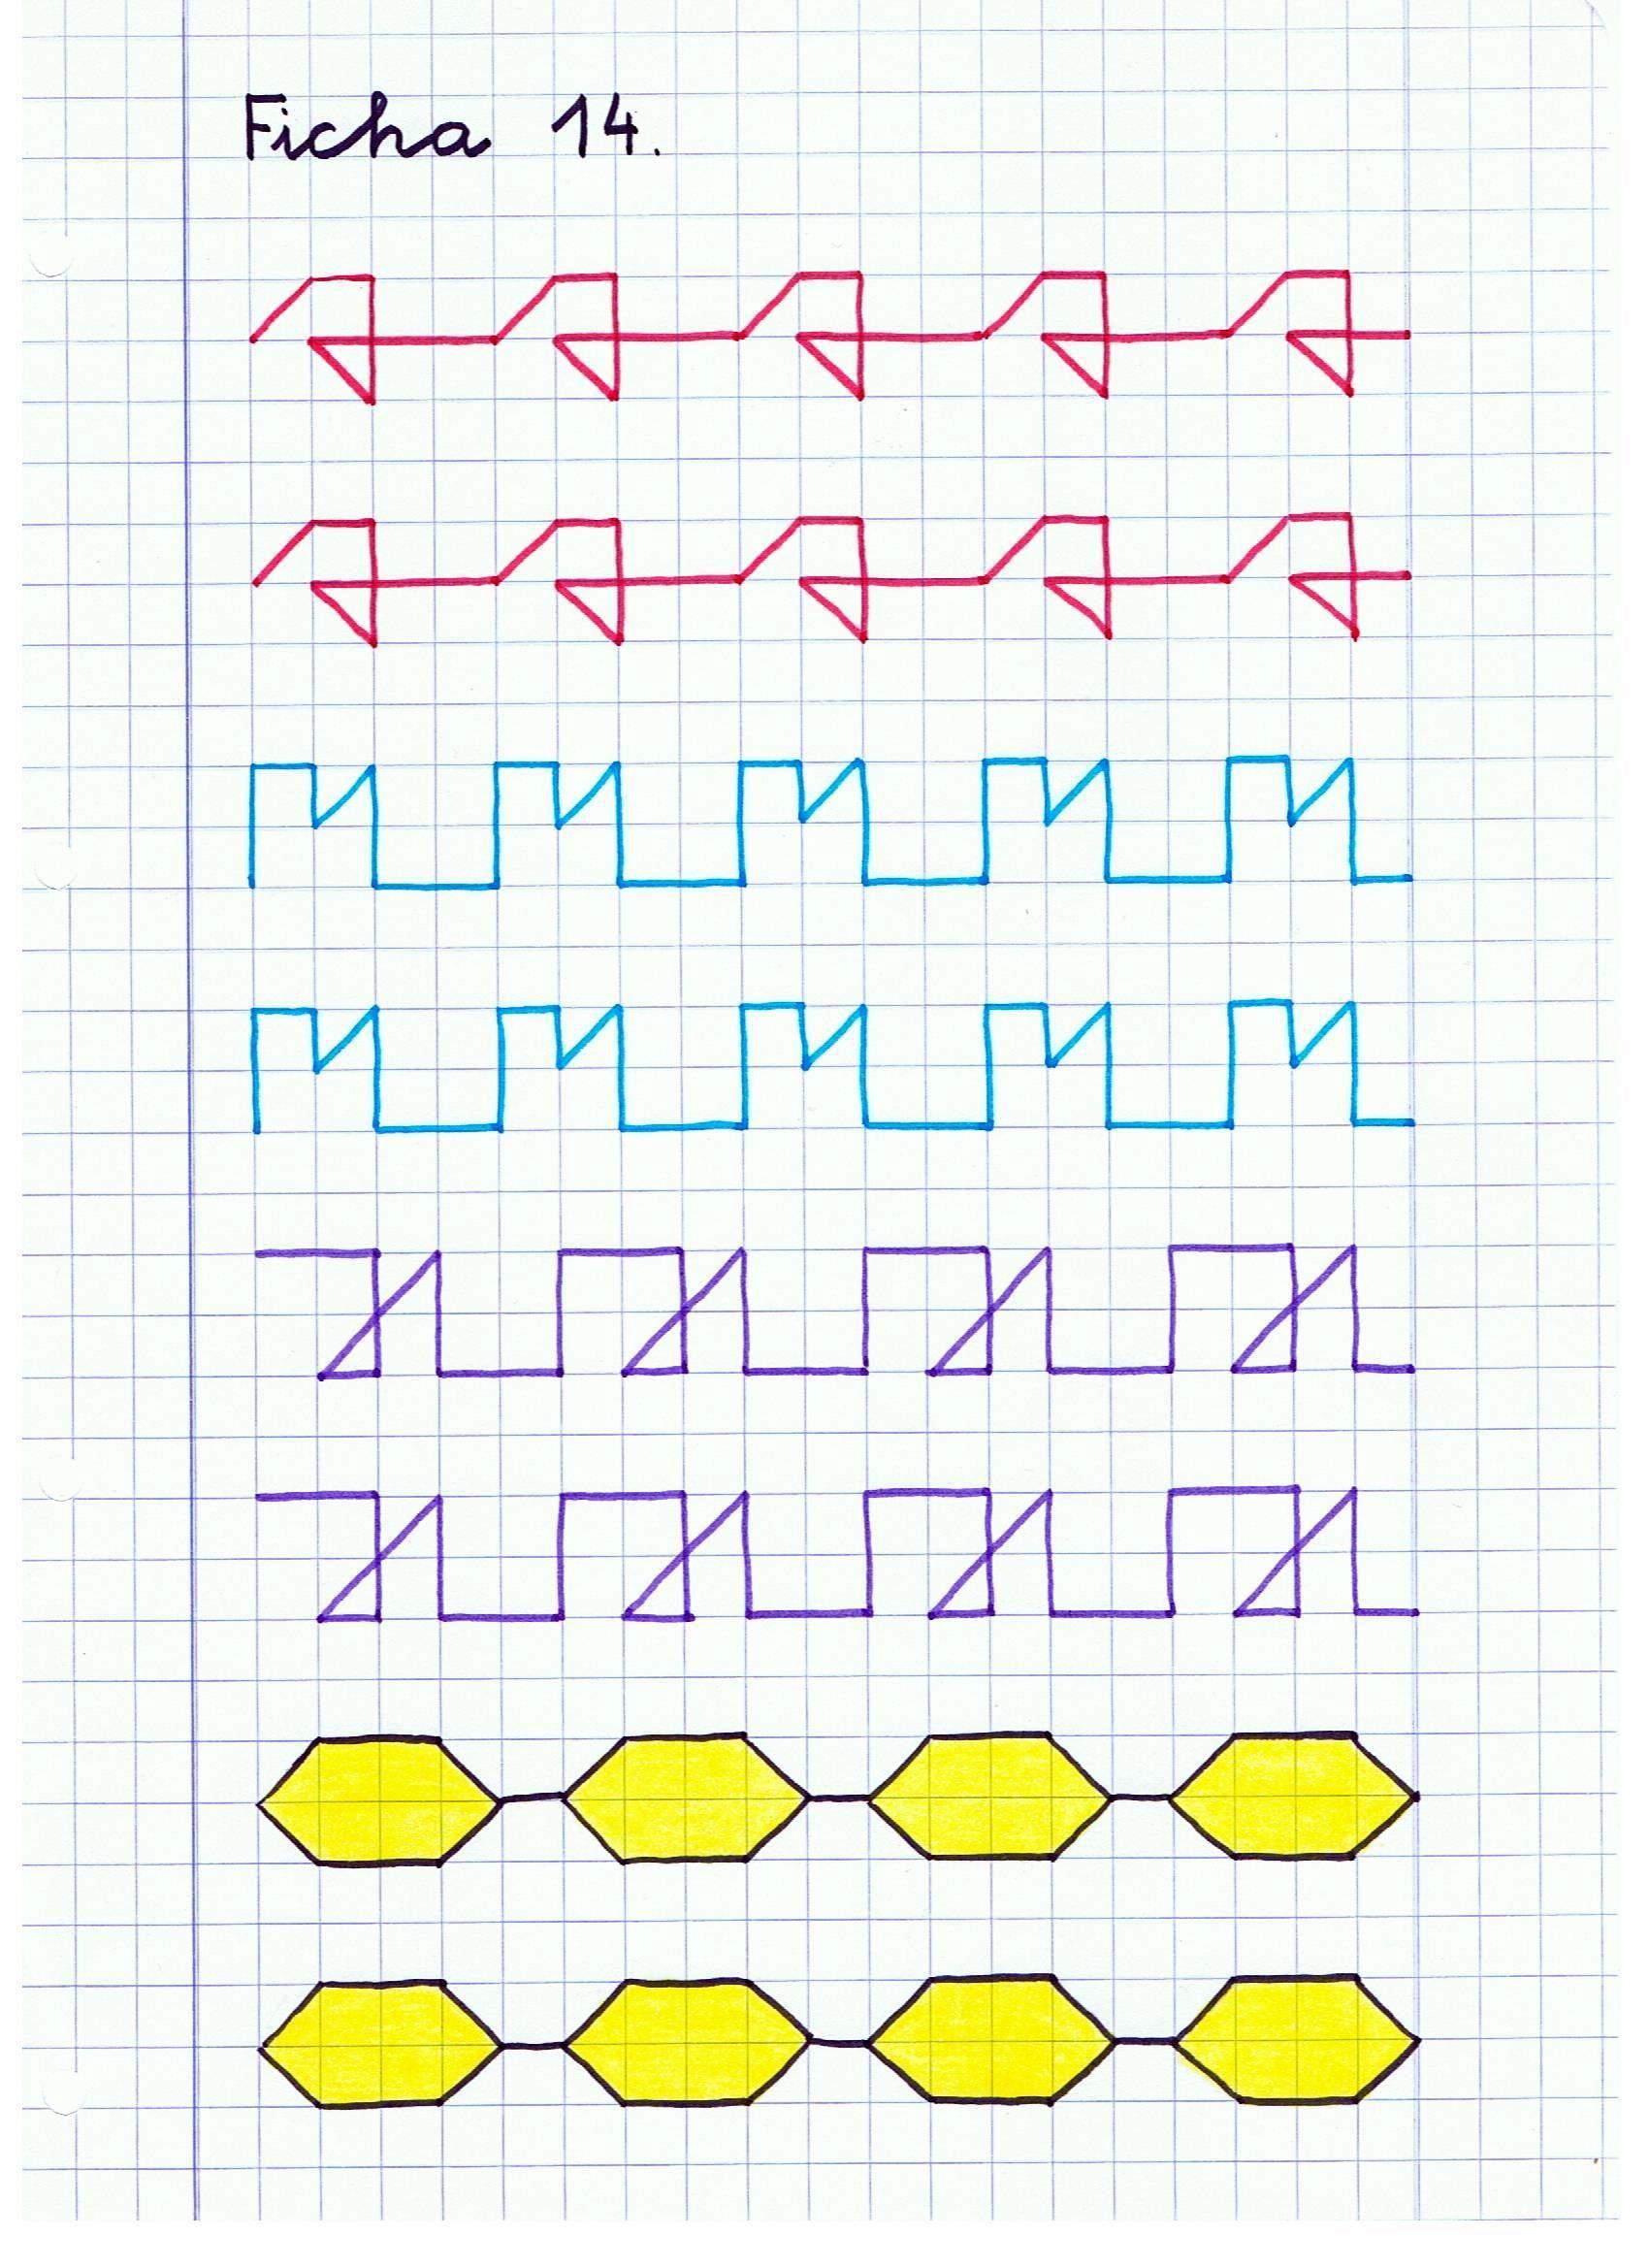 Caligrafia Material De Refuerzo I Web Del Maestro Ejercicios De Escritura Practica De La Caligrafia Practica De Escritura A Mano